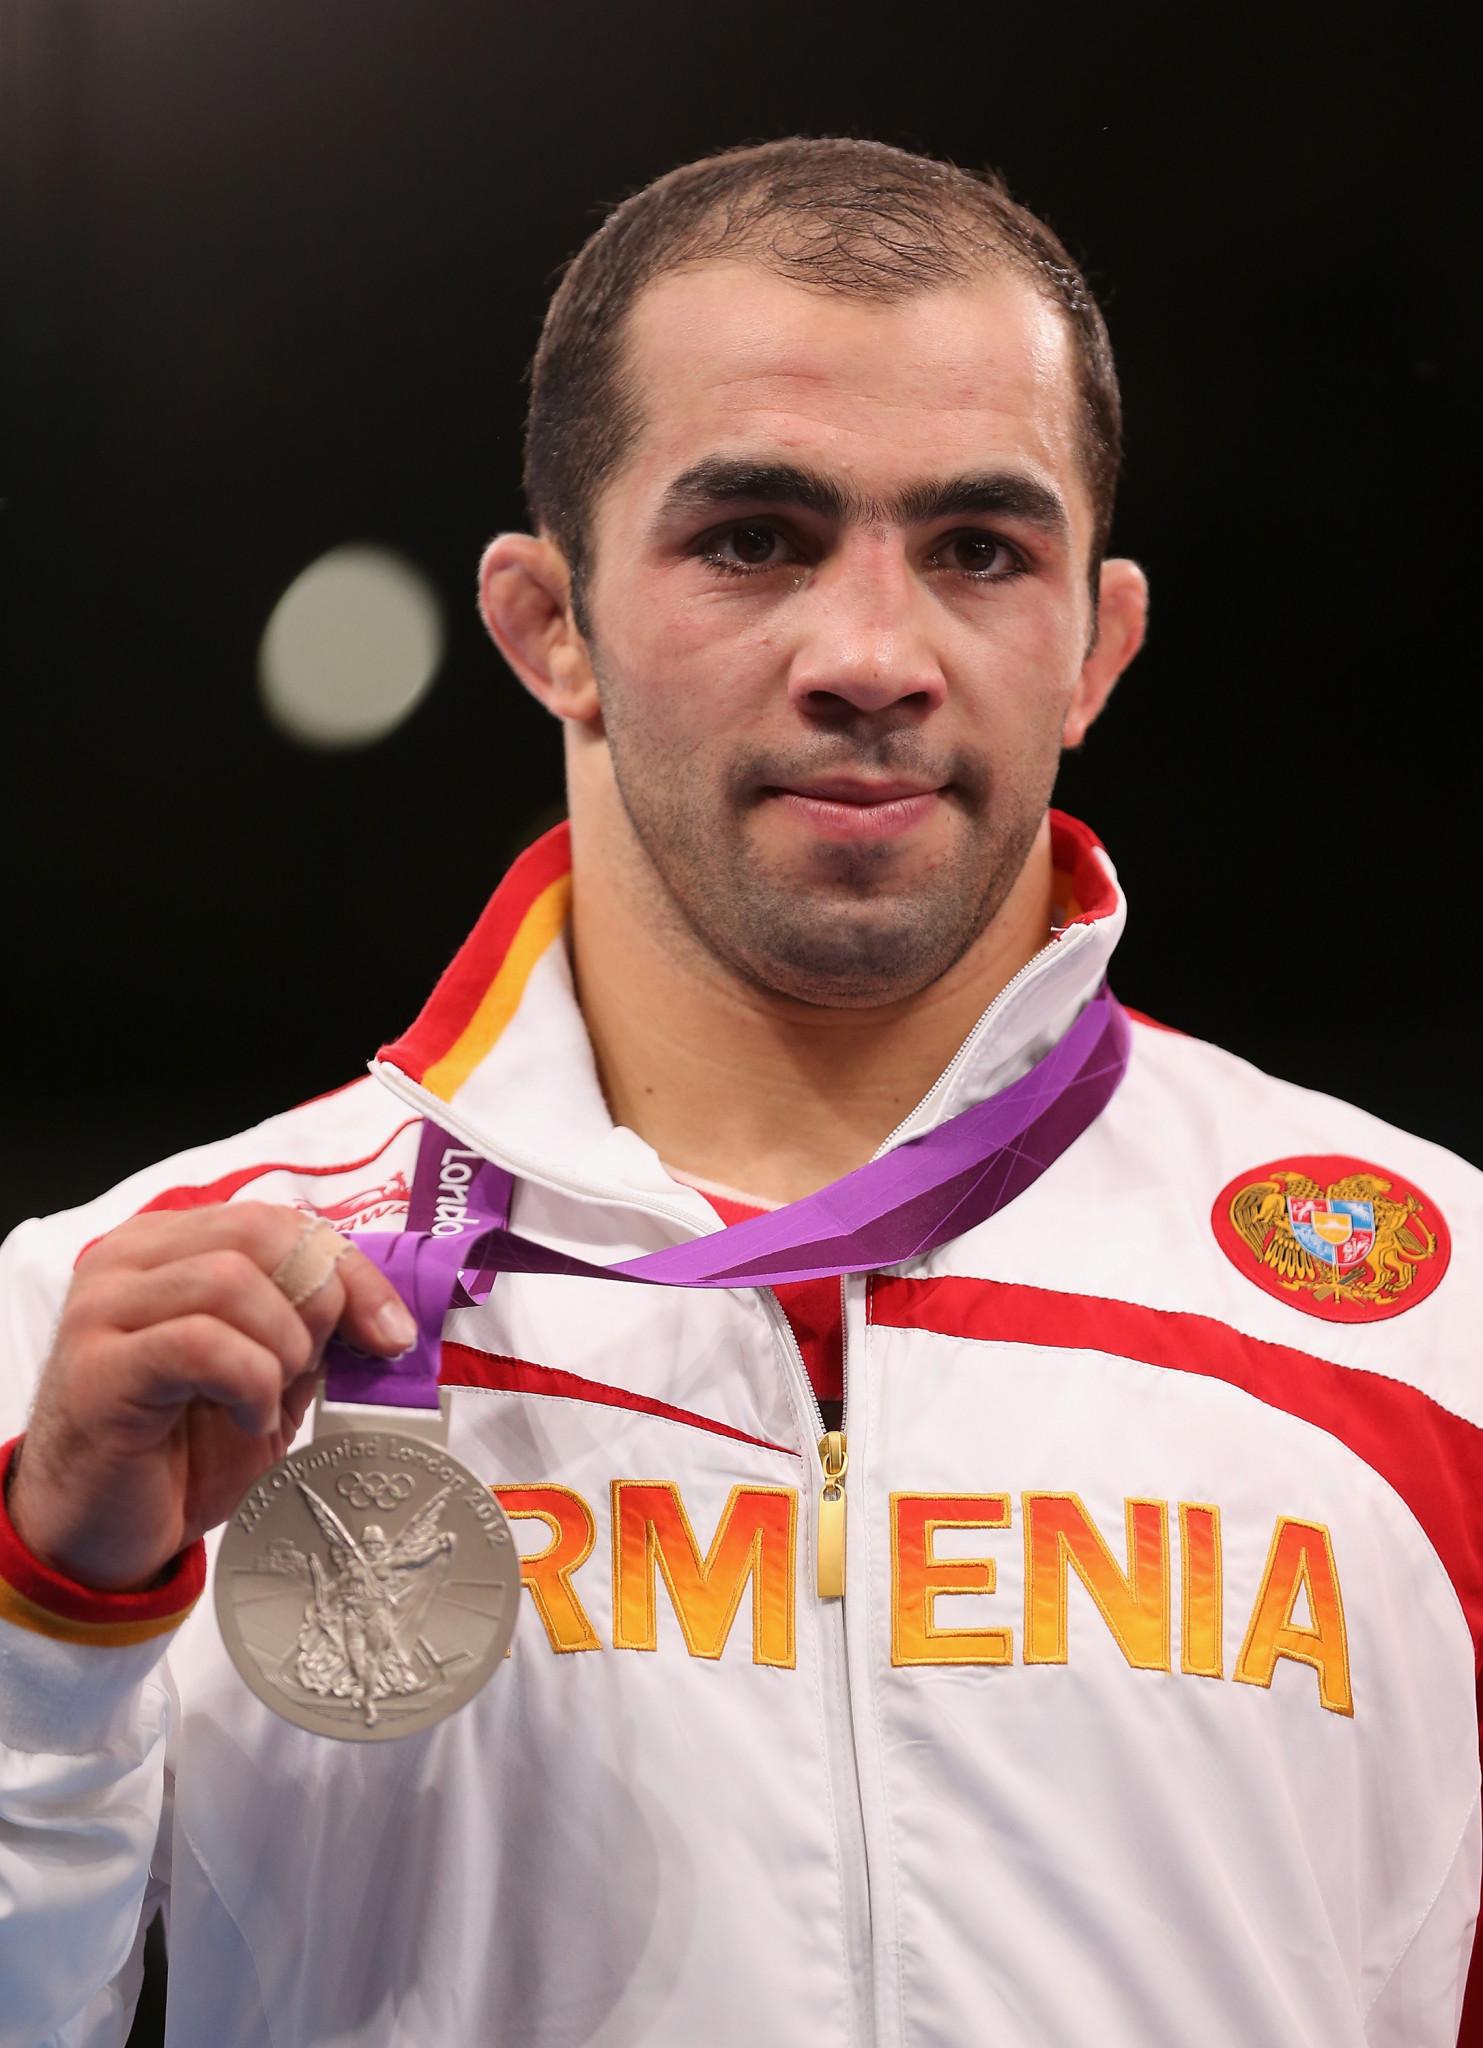 Arsen Julfalakyan has praised the link-up between World Taekwondo, the Taekwondo Humanitarian Federation and United World Wrestling ©Getty Images